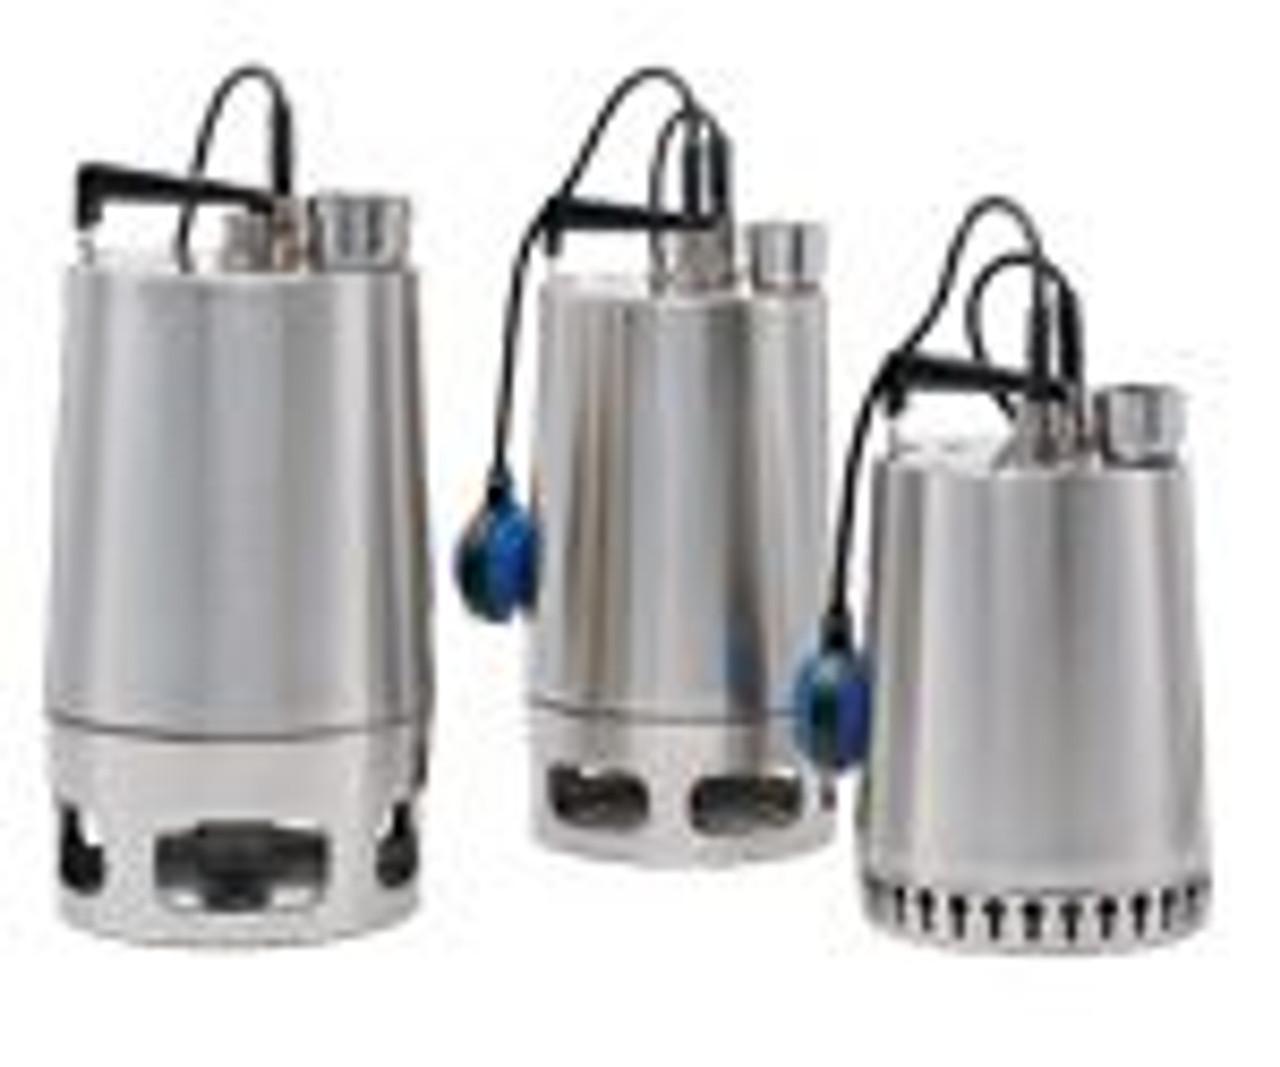 Grundfos Unilift AP12-40-06-A1 Automatic Submersible Drainage & Sump Pump